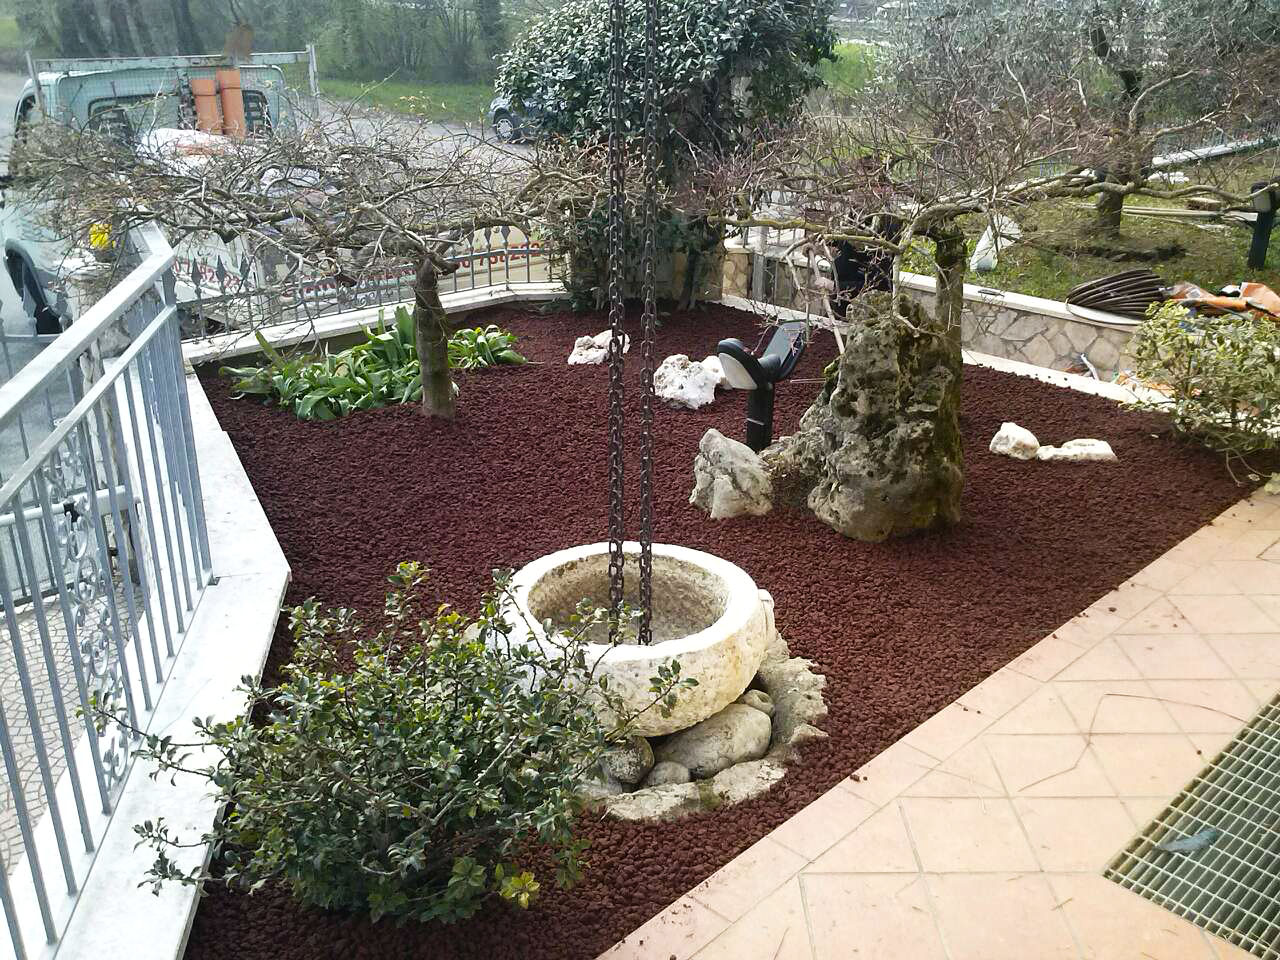 Giardini moderni amazing giardino allinglese with - Piccoli giardini moderni ...